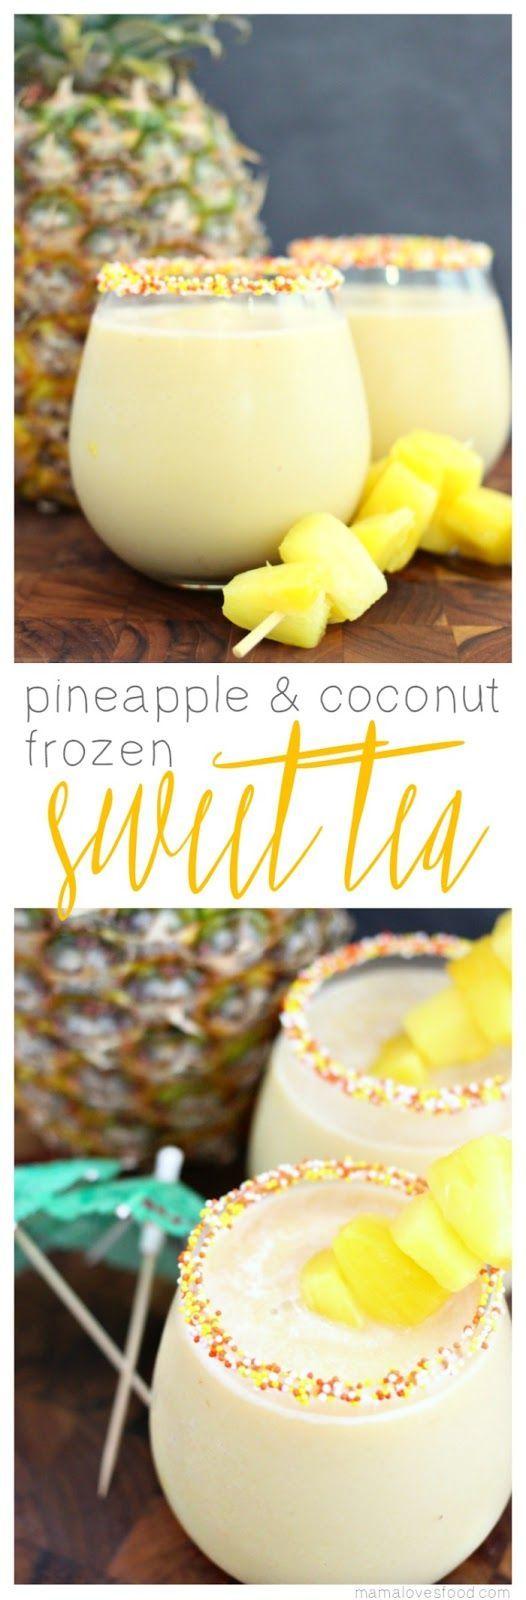 Pineapple & Coconut Frozen Sweet Tea Recipe